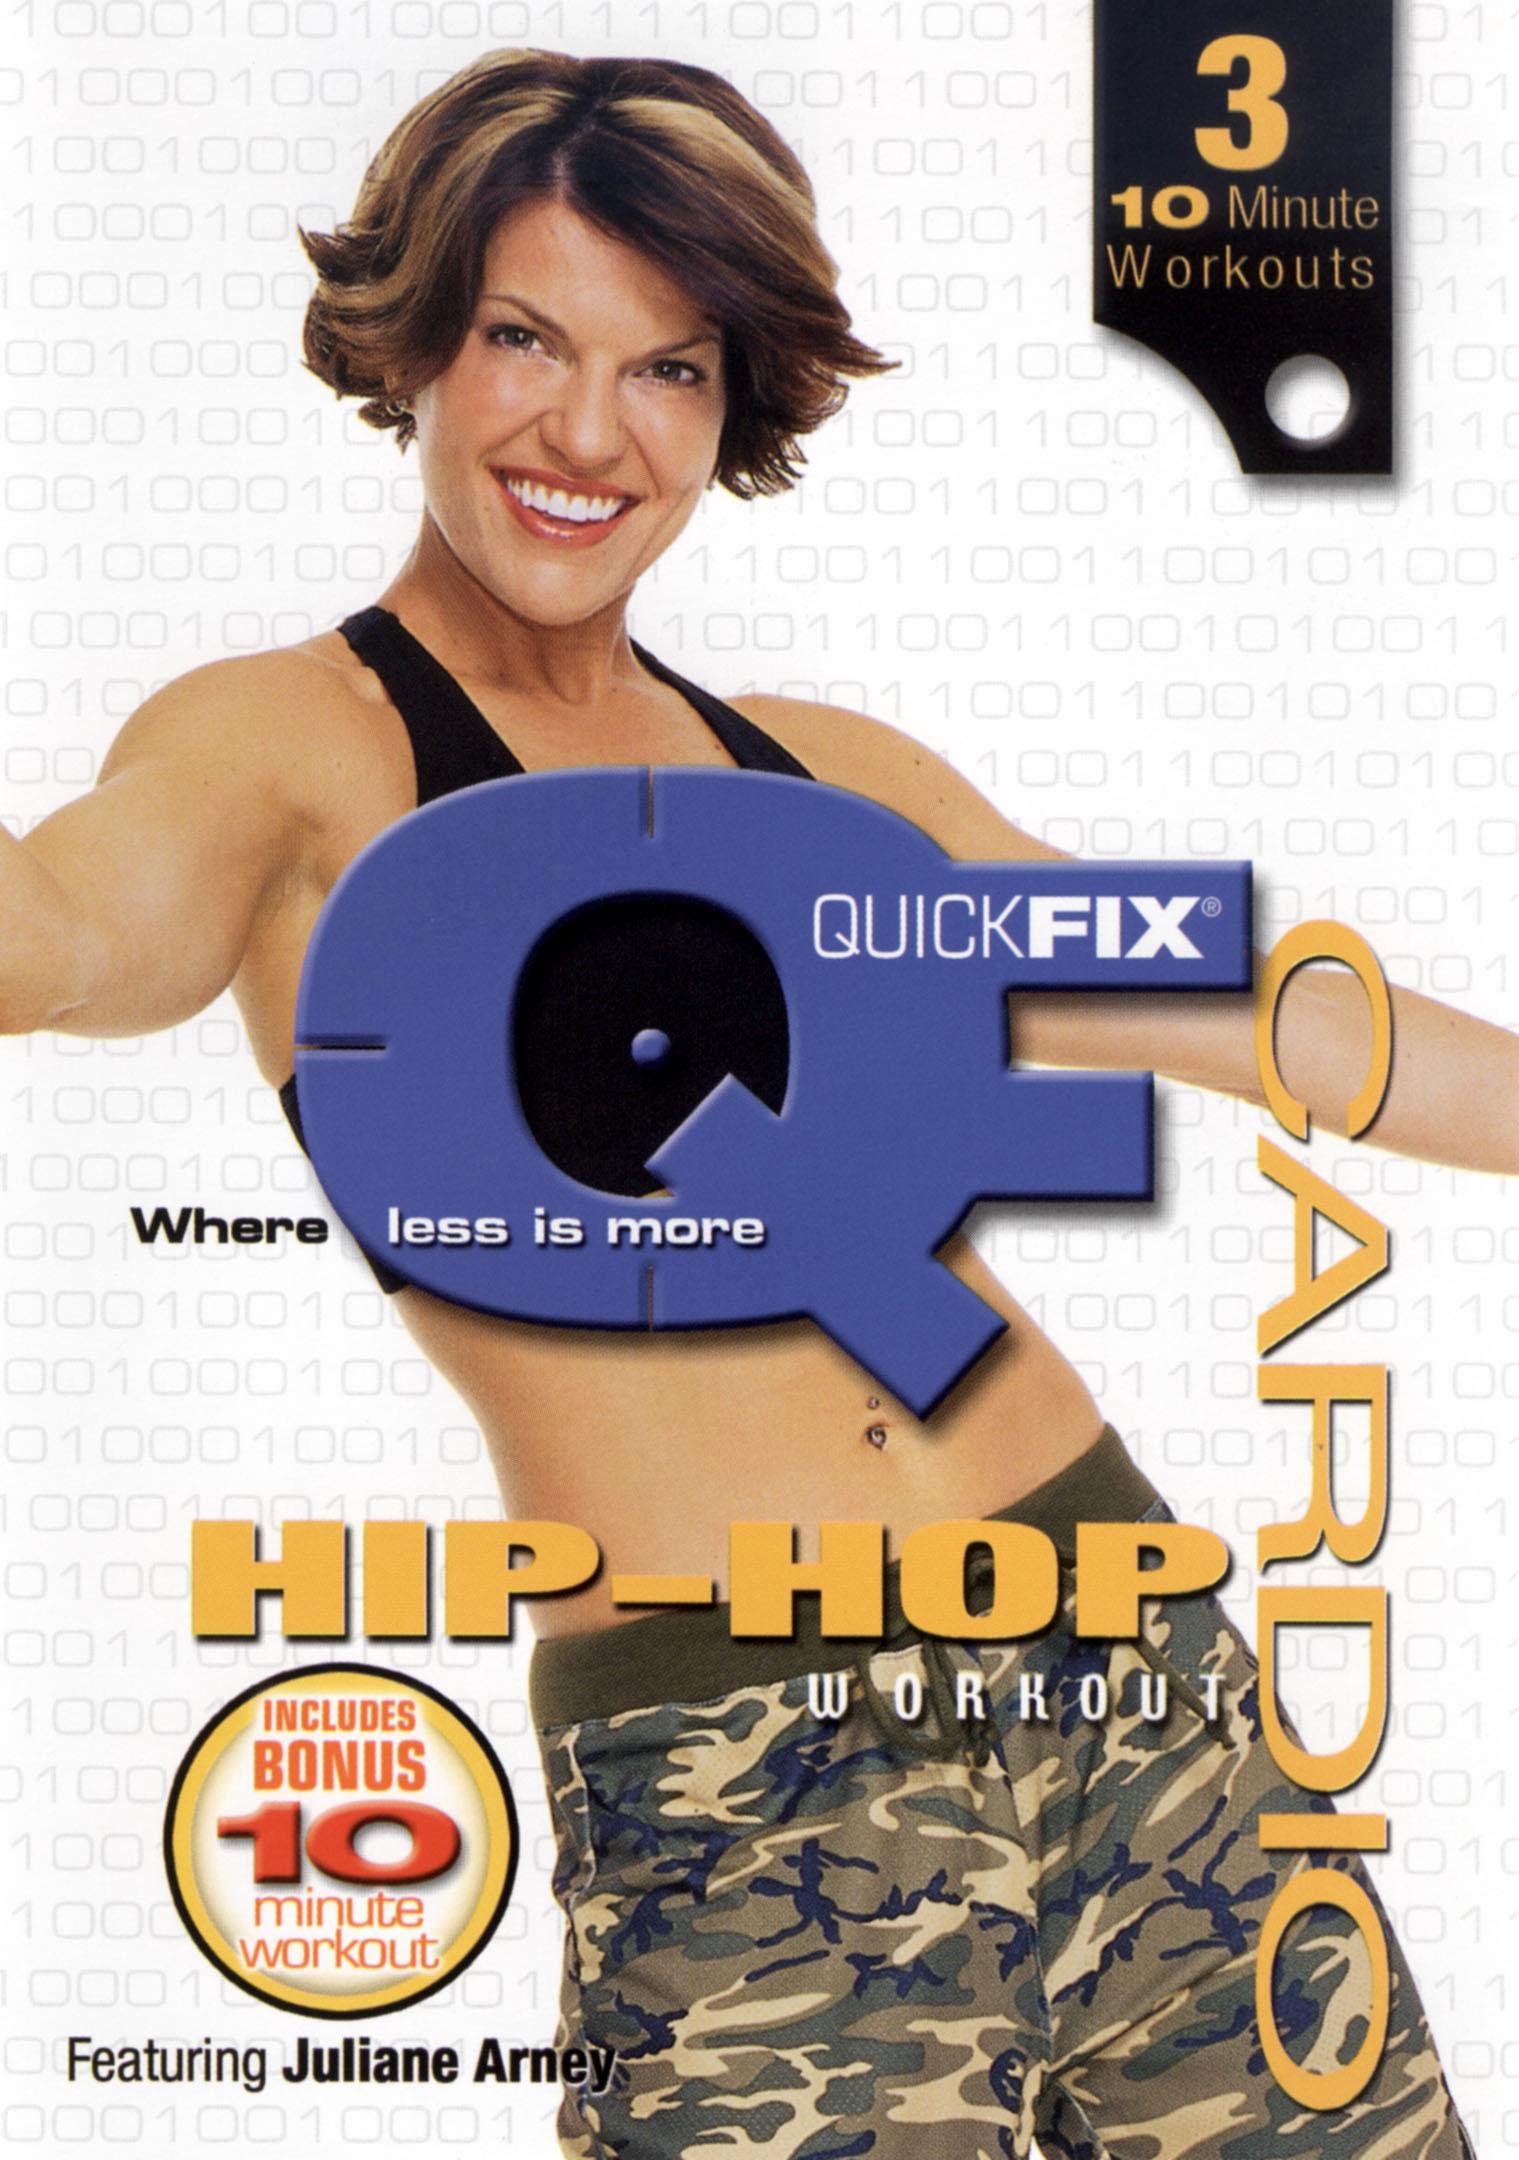 Quick Fix: Cardio Hip-Hop Workout